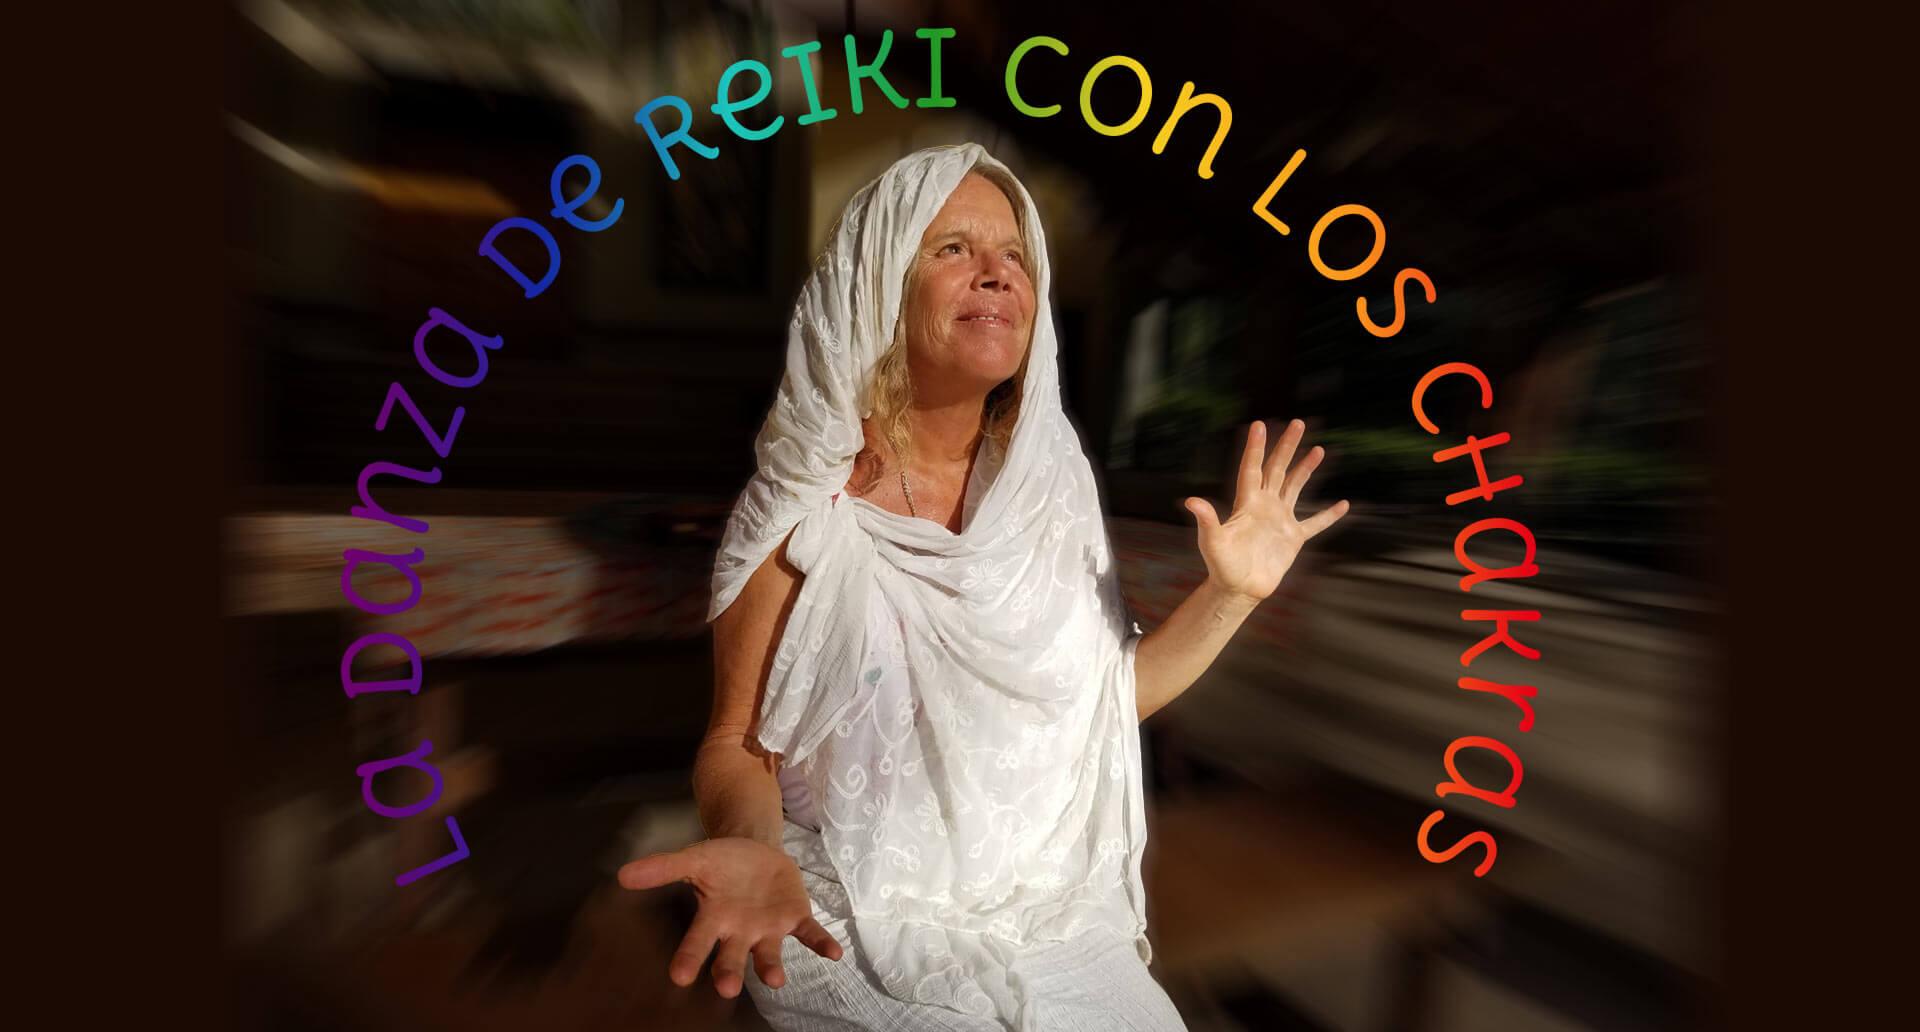 Evento: La danza de reiki con los chakras